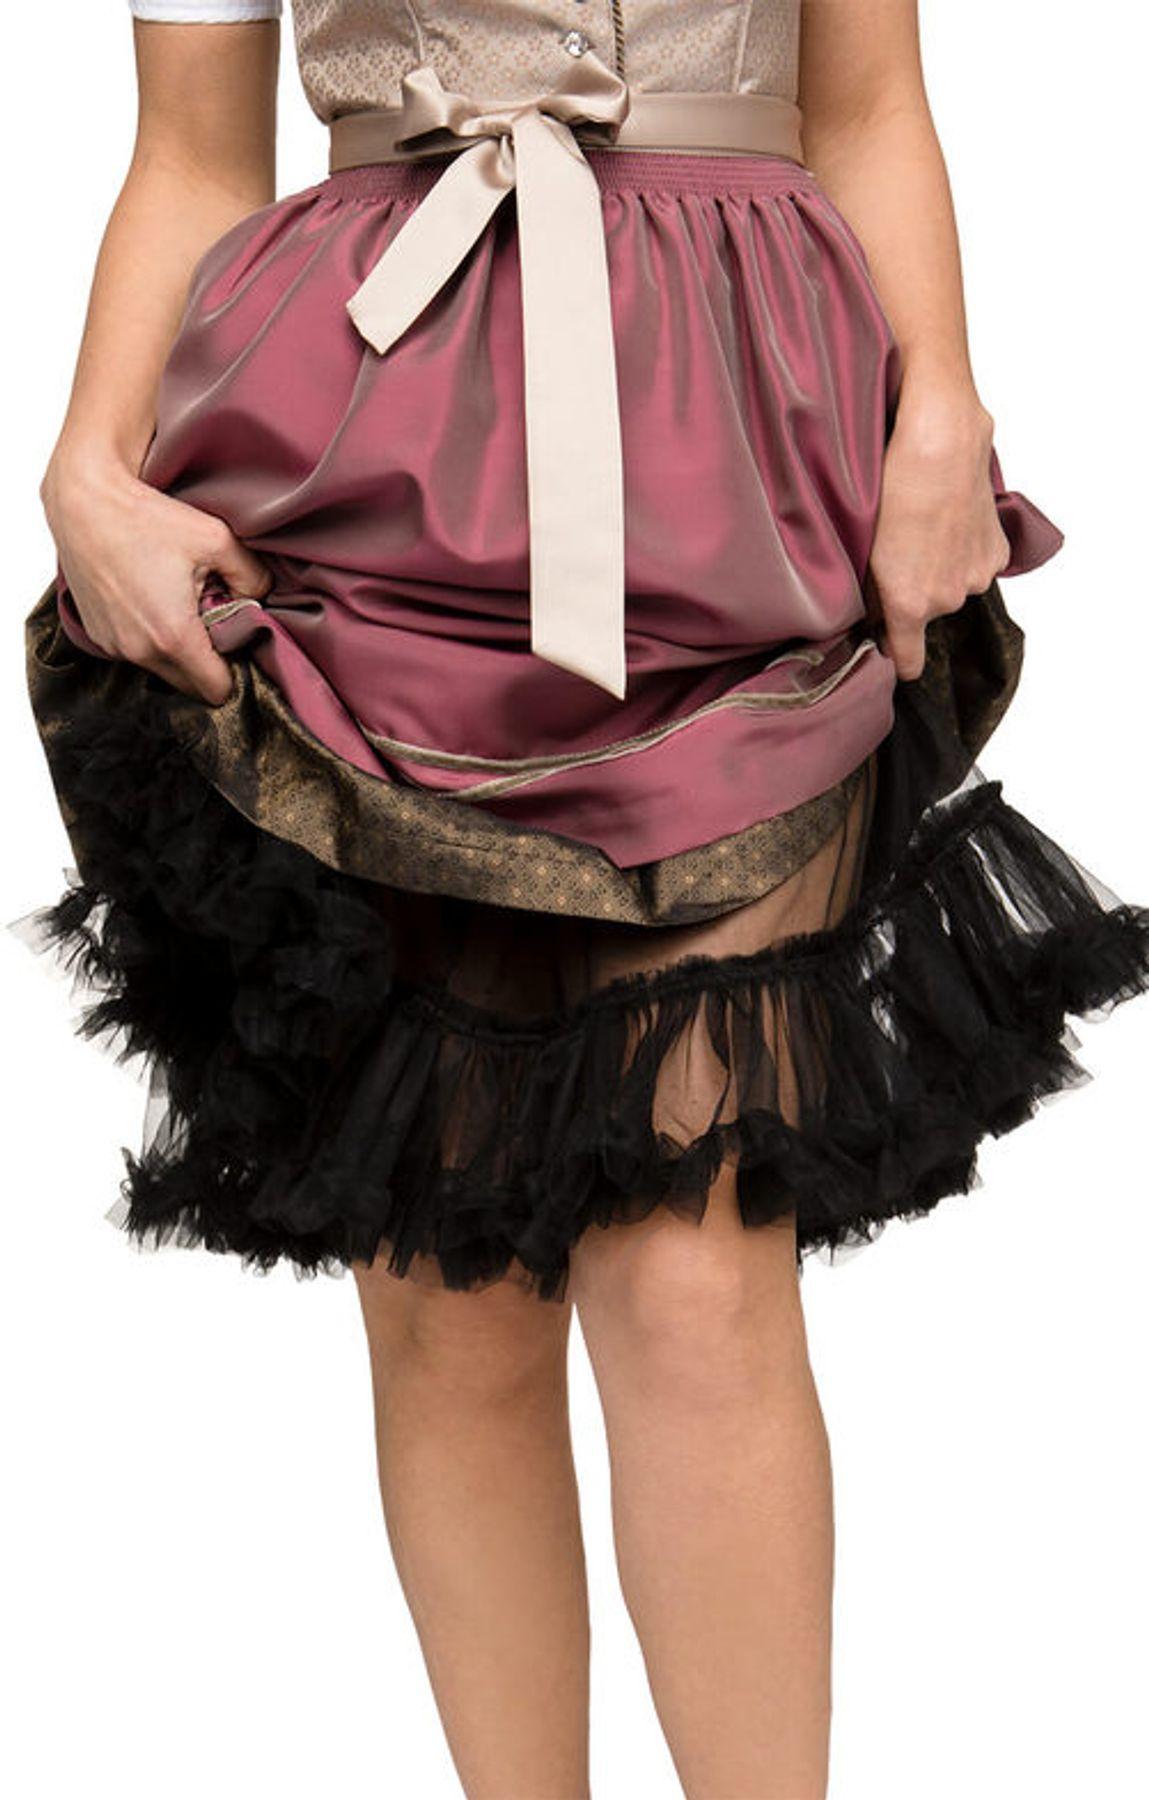 Stockerpoint - Trachten Dirndl Petticoats 60cm, U-90 – Bild 2